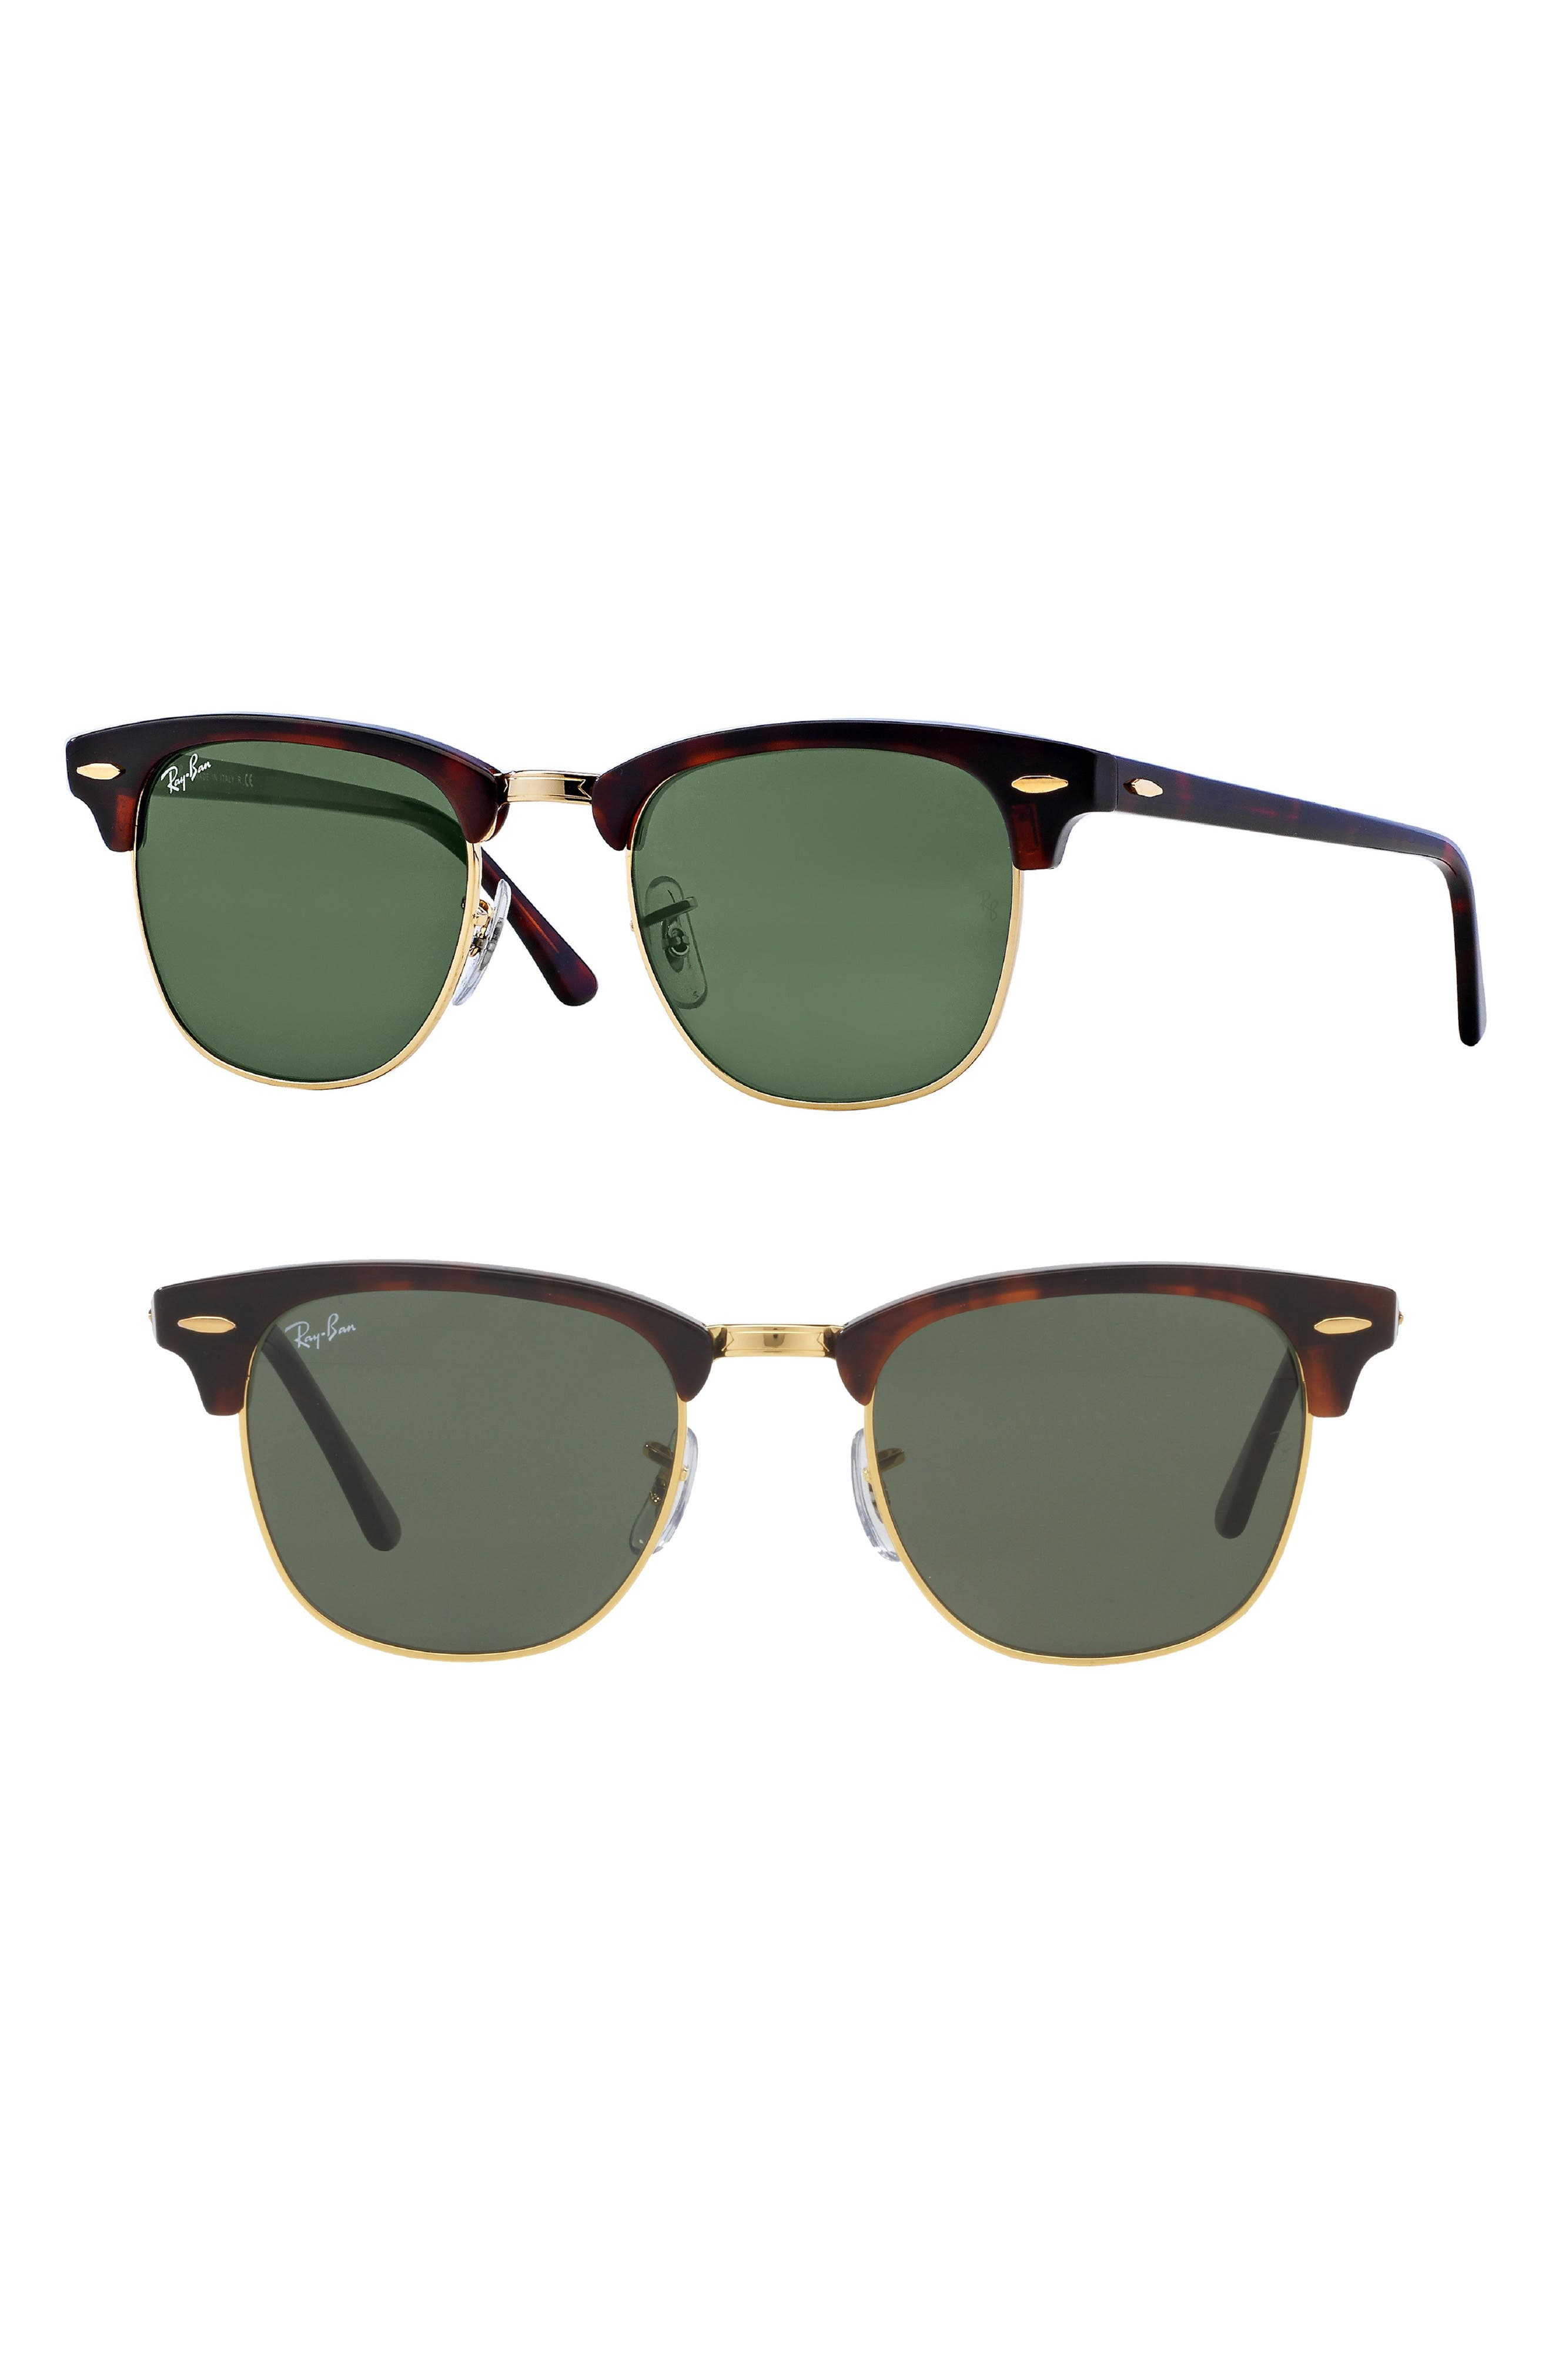 Ray-Ban Standard Clubmaster 51Mm Sunglasses - Dark Tortoise